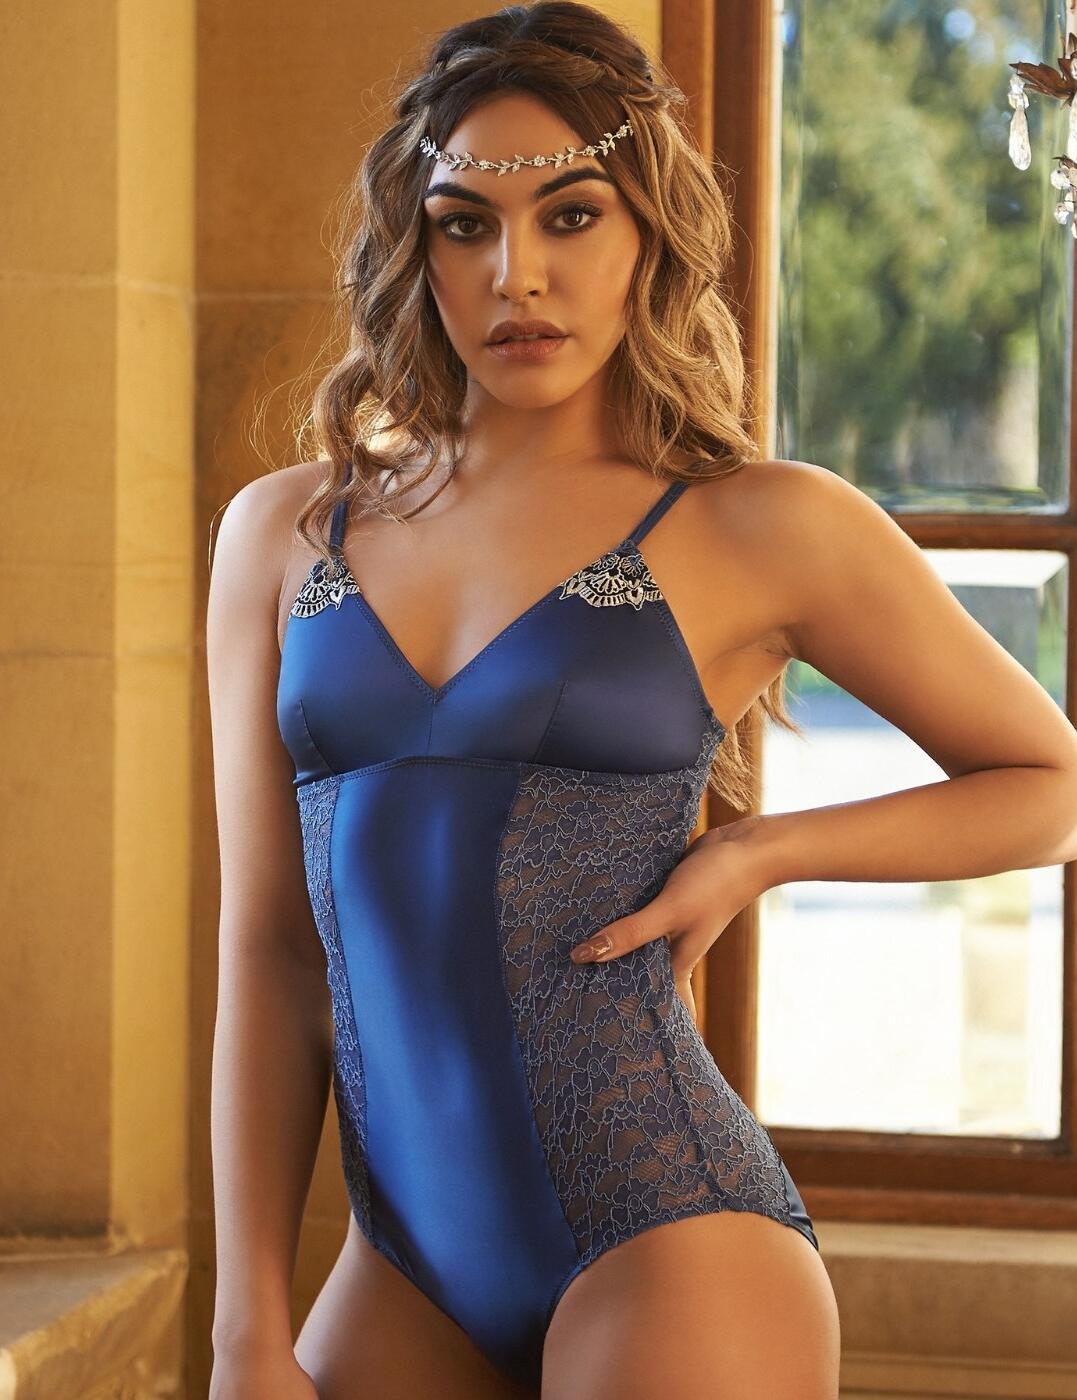 B002 Tallulah Love Aphrodite Body Gift Box - B002 Blue